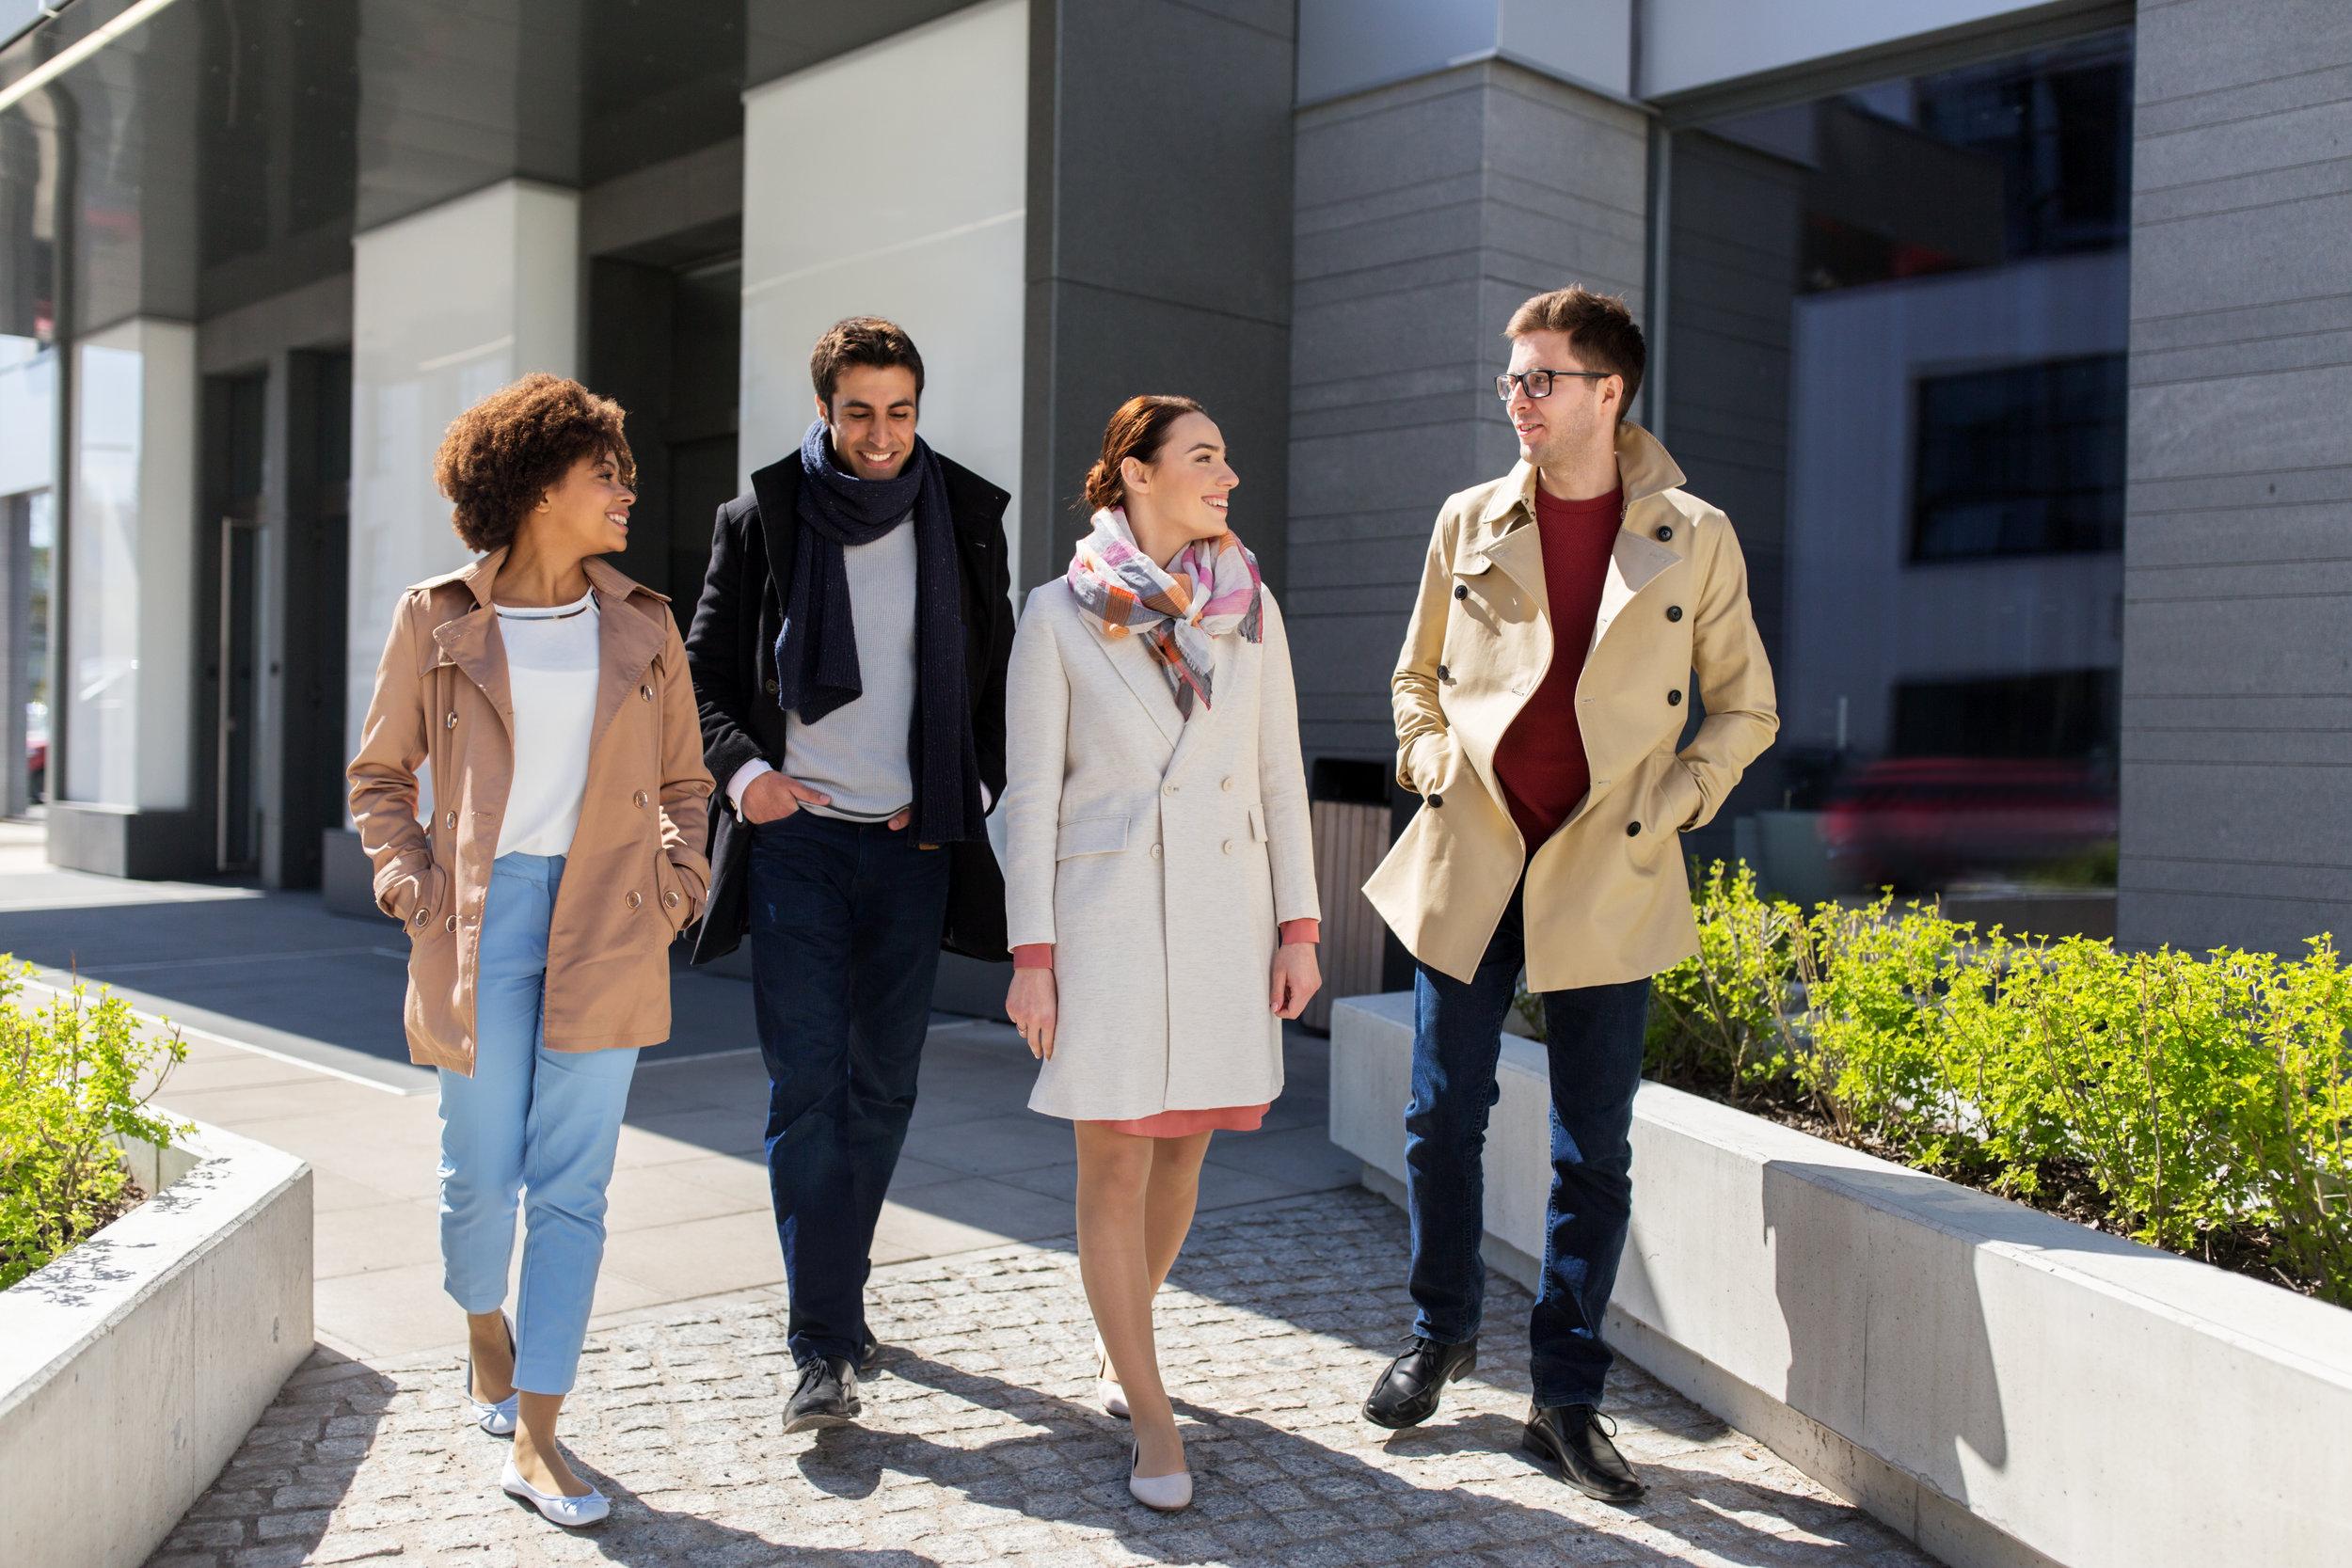 international-group-of-people-on-city-street-PMDS3XS.jpg